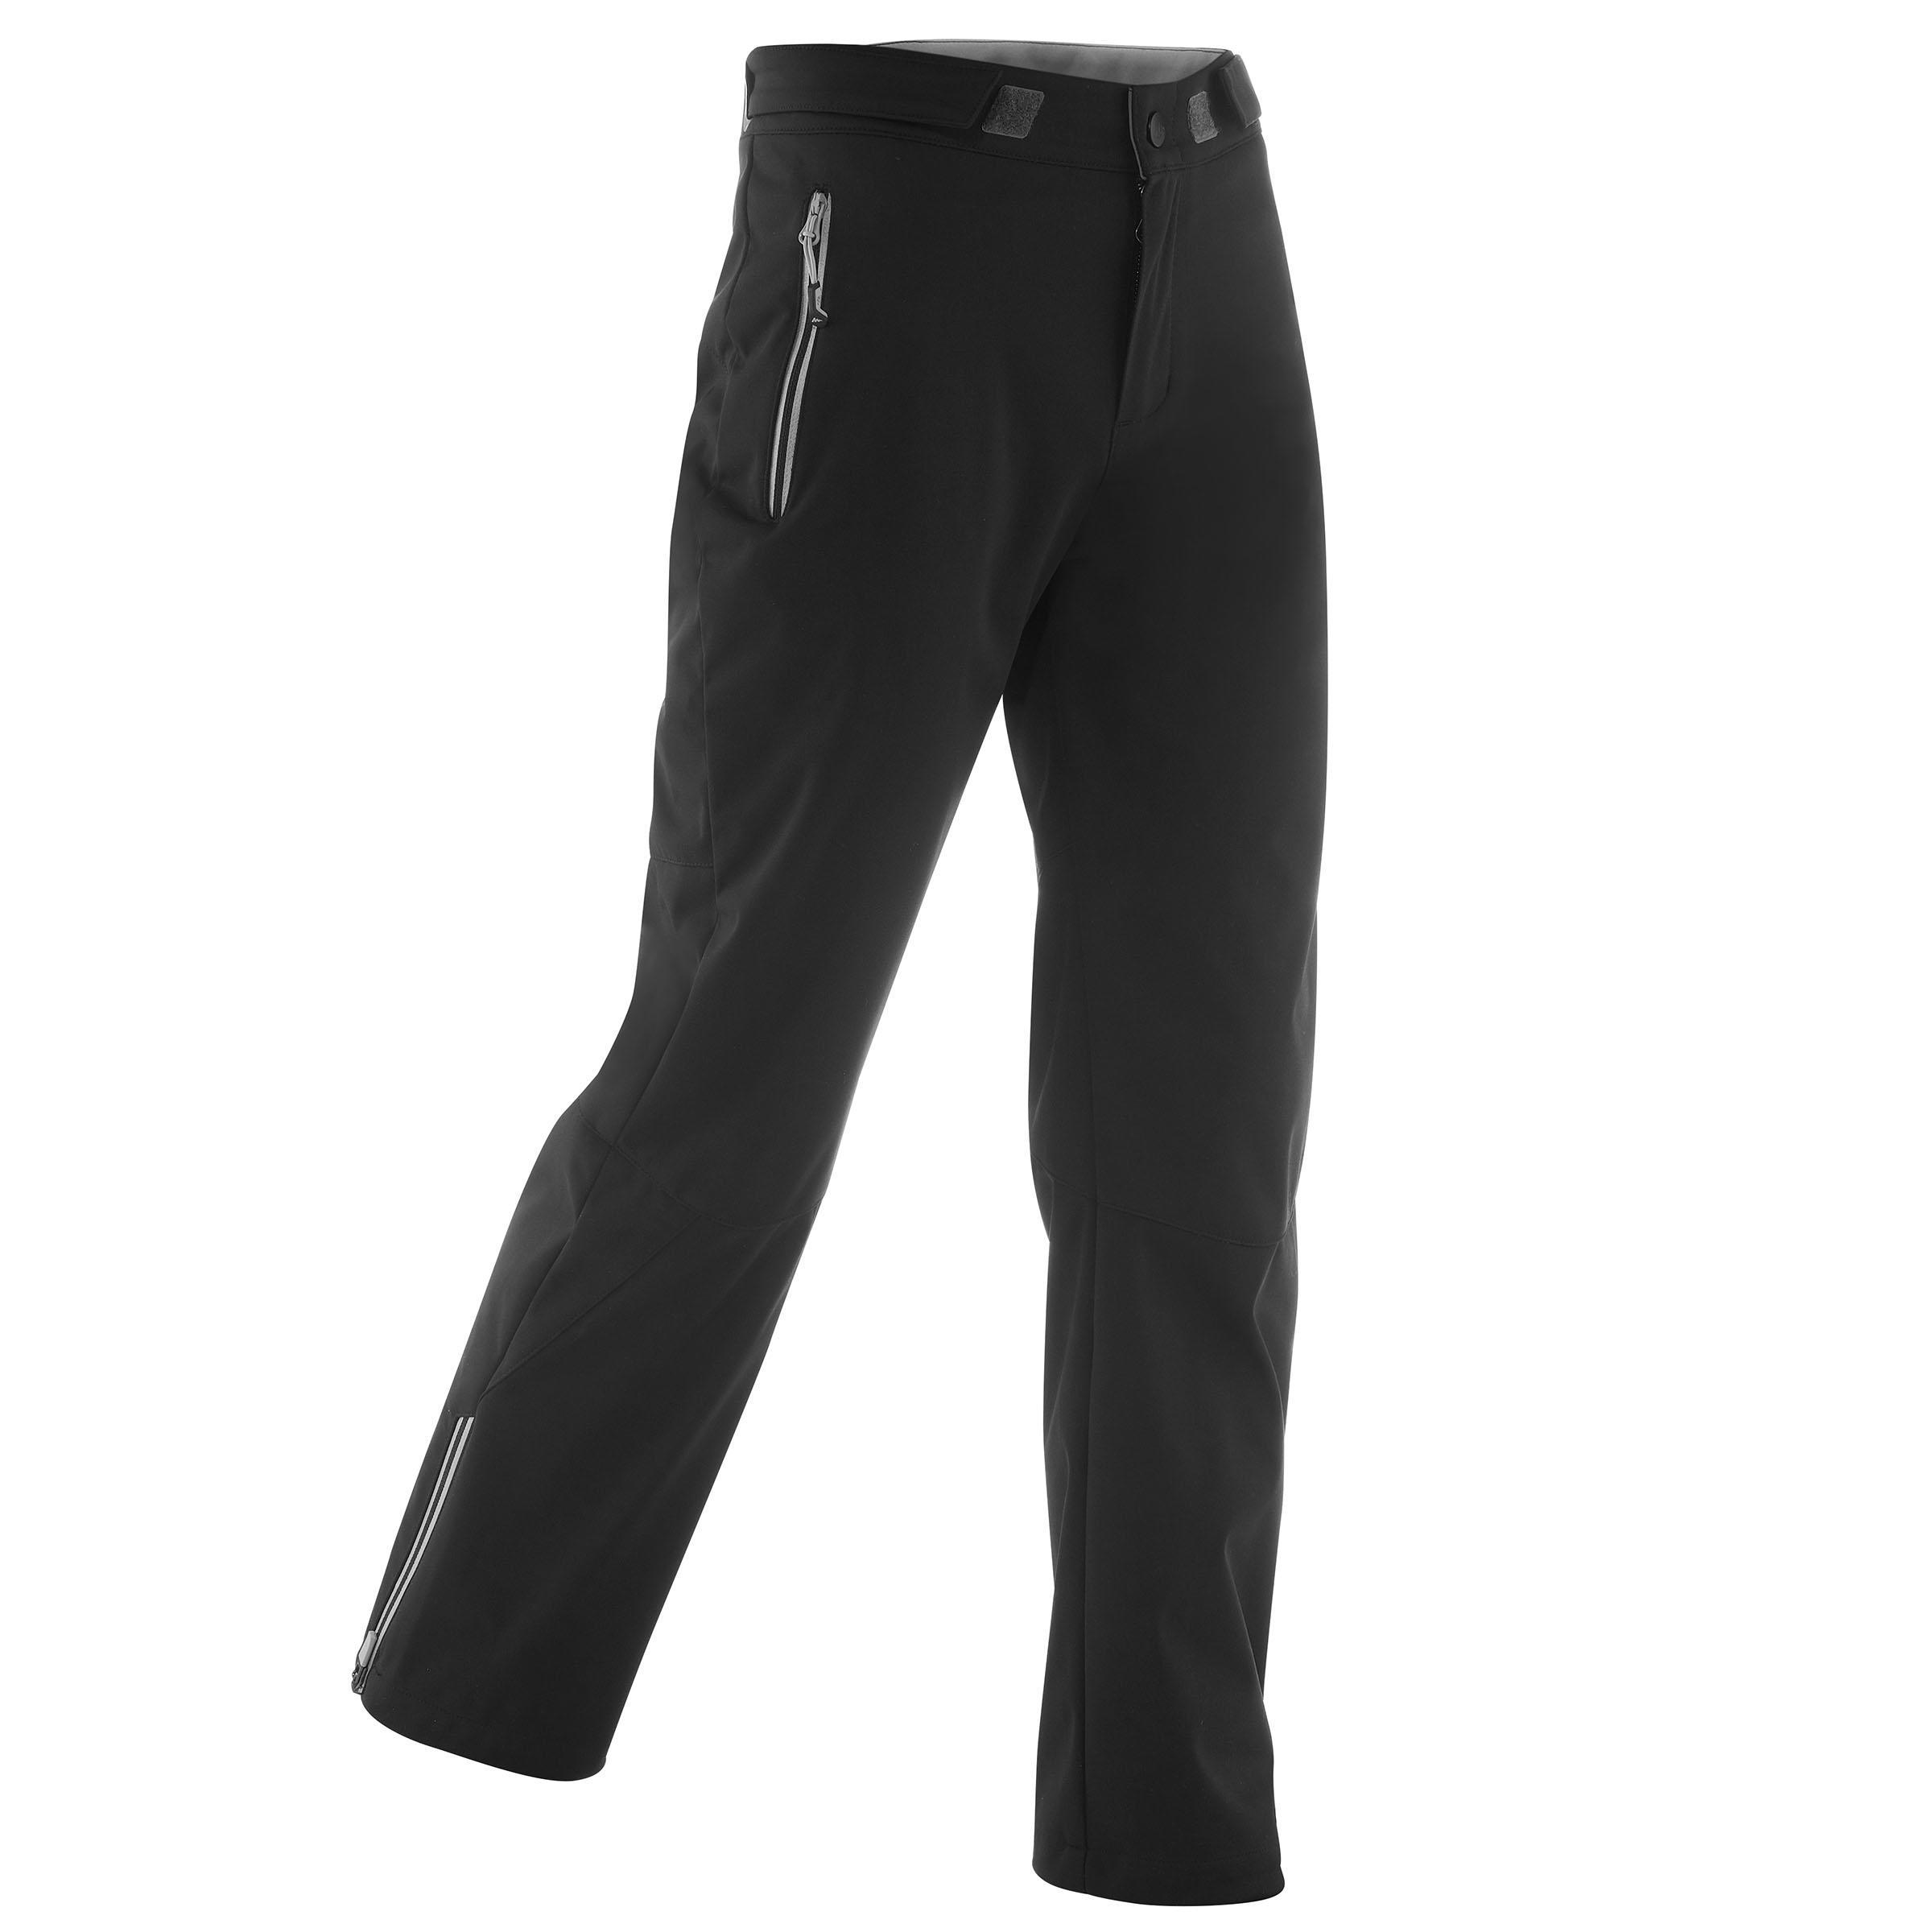 Xc s 500 Junior Cross-Country Skiing Pants - Black